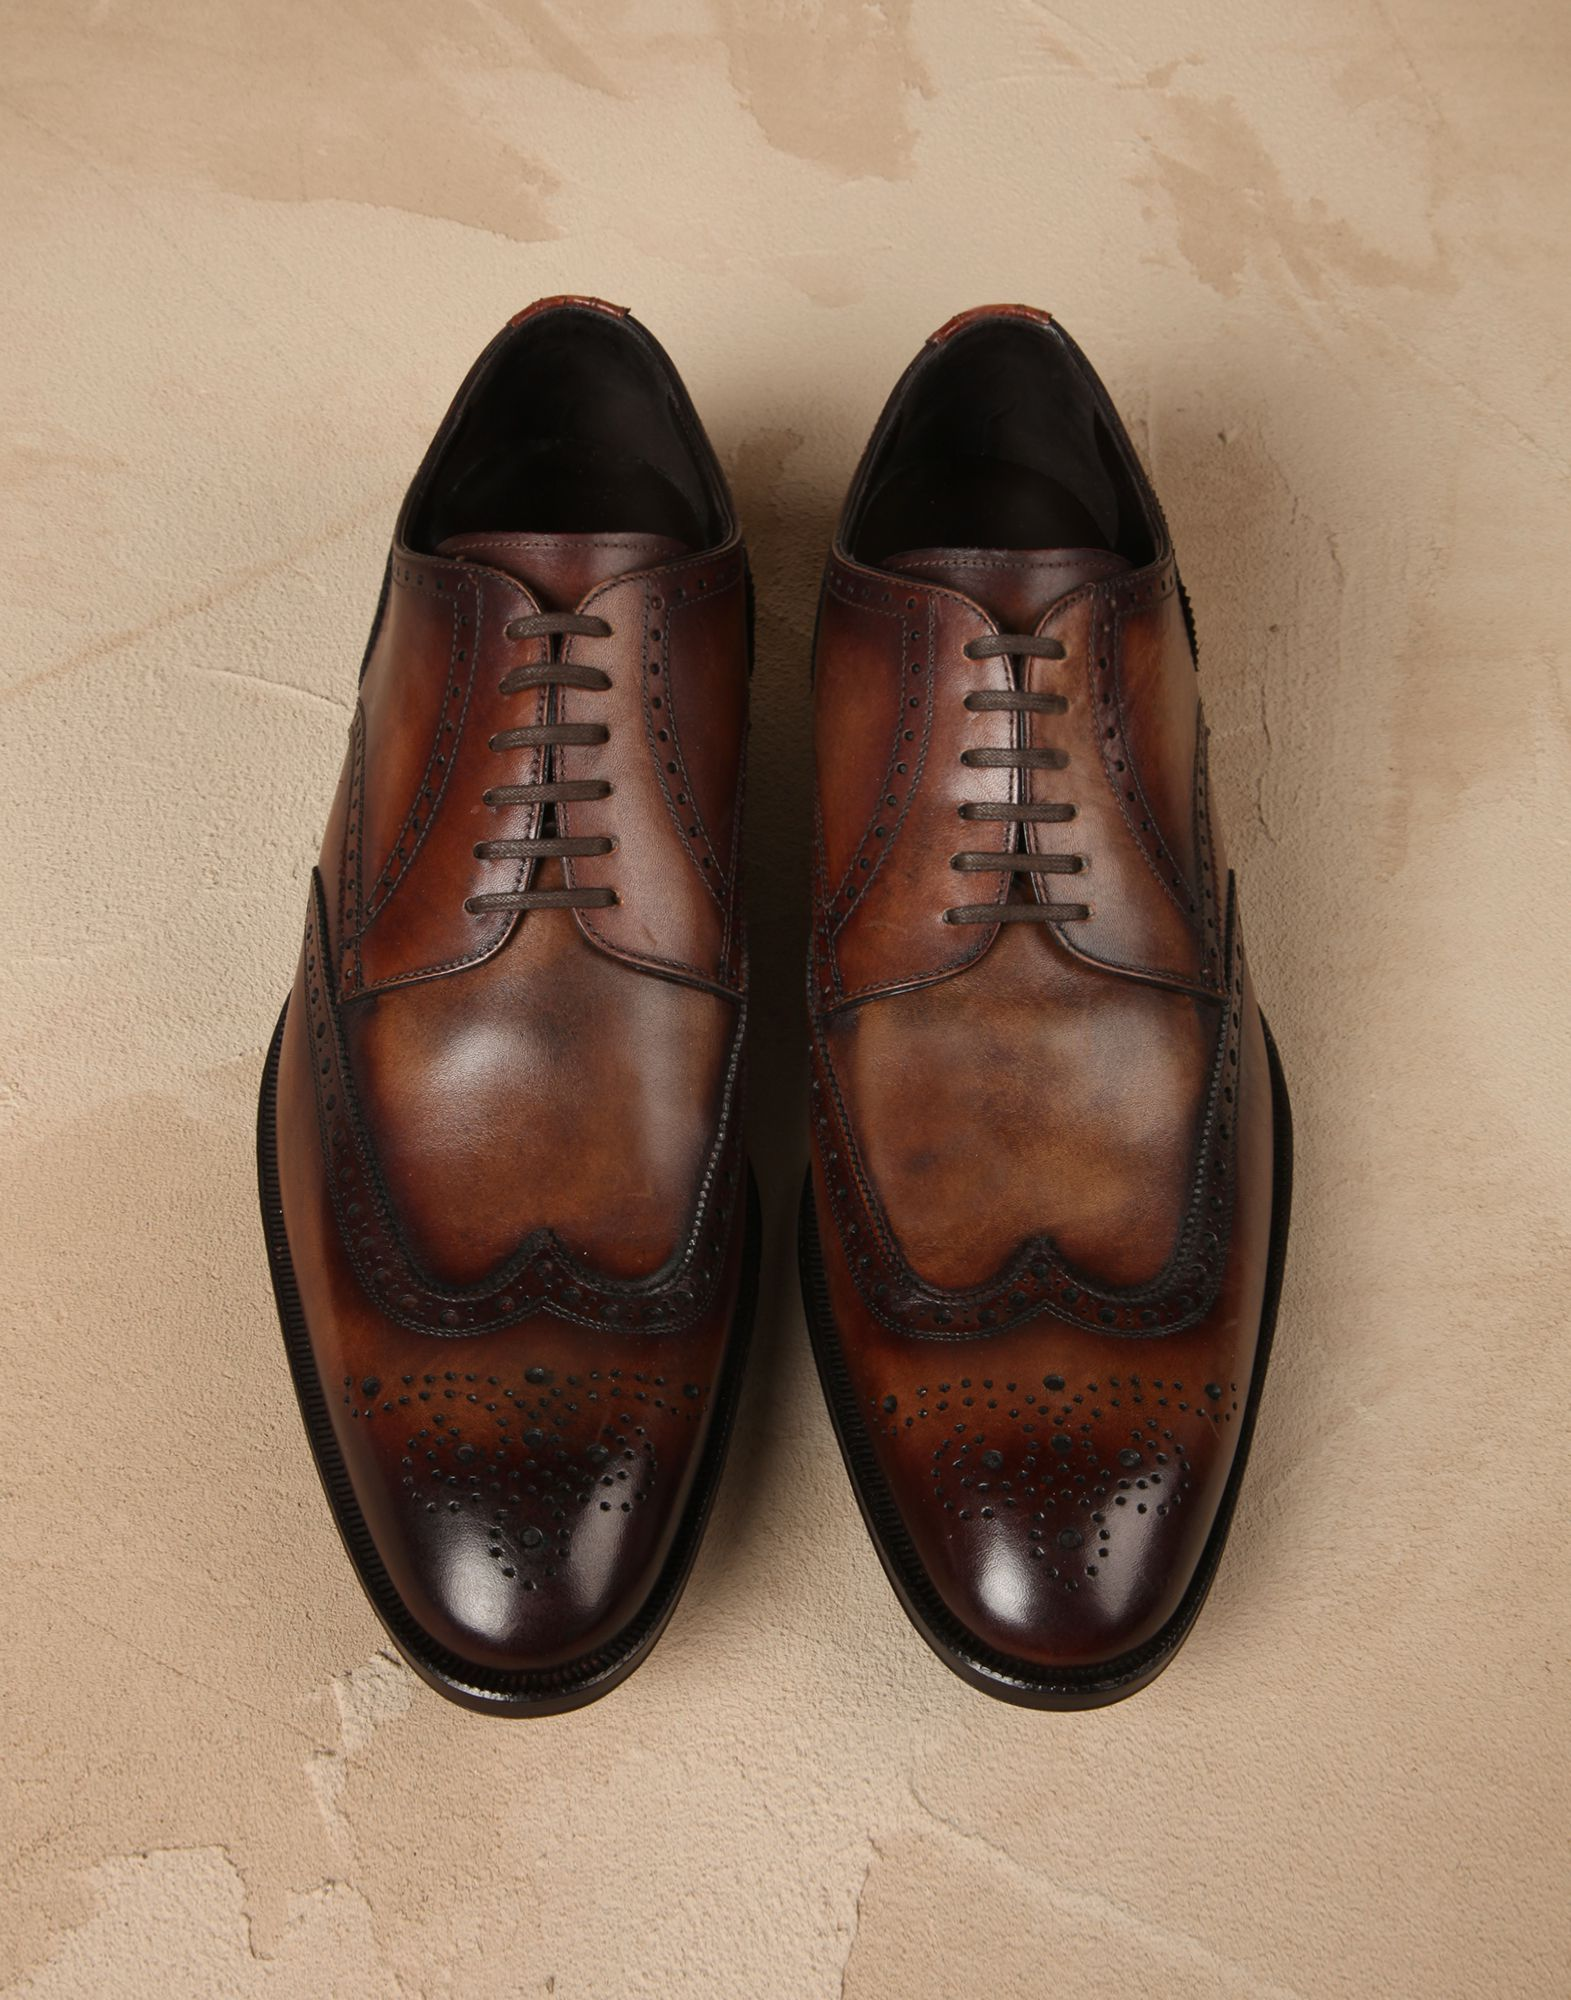 Calfskin portofino derby shoes Men - Dolce&Gabbana